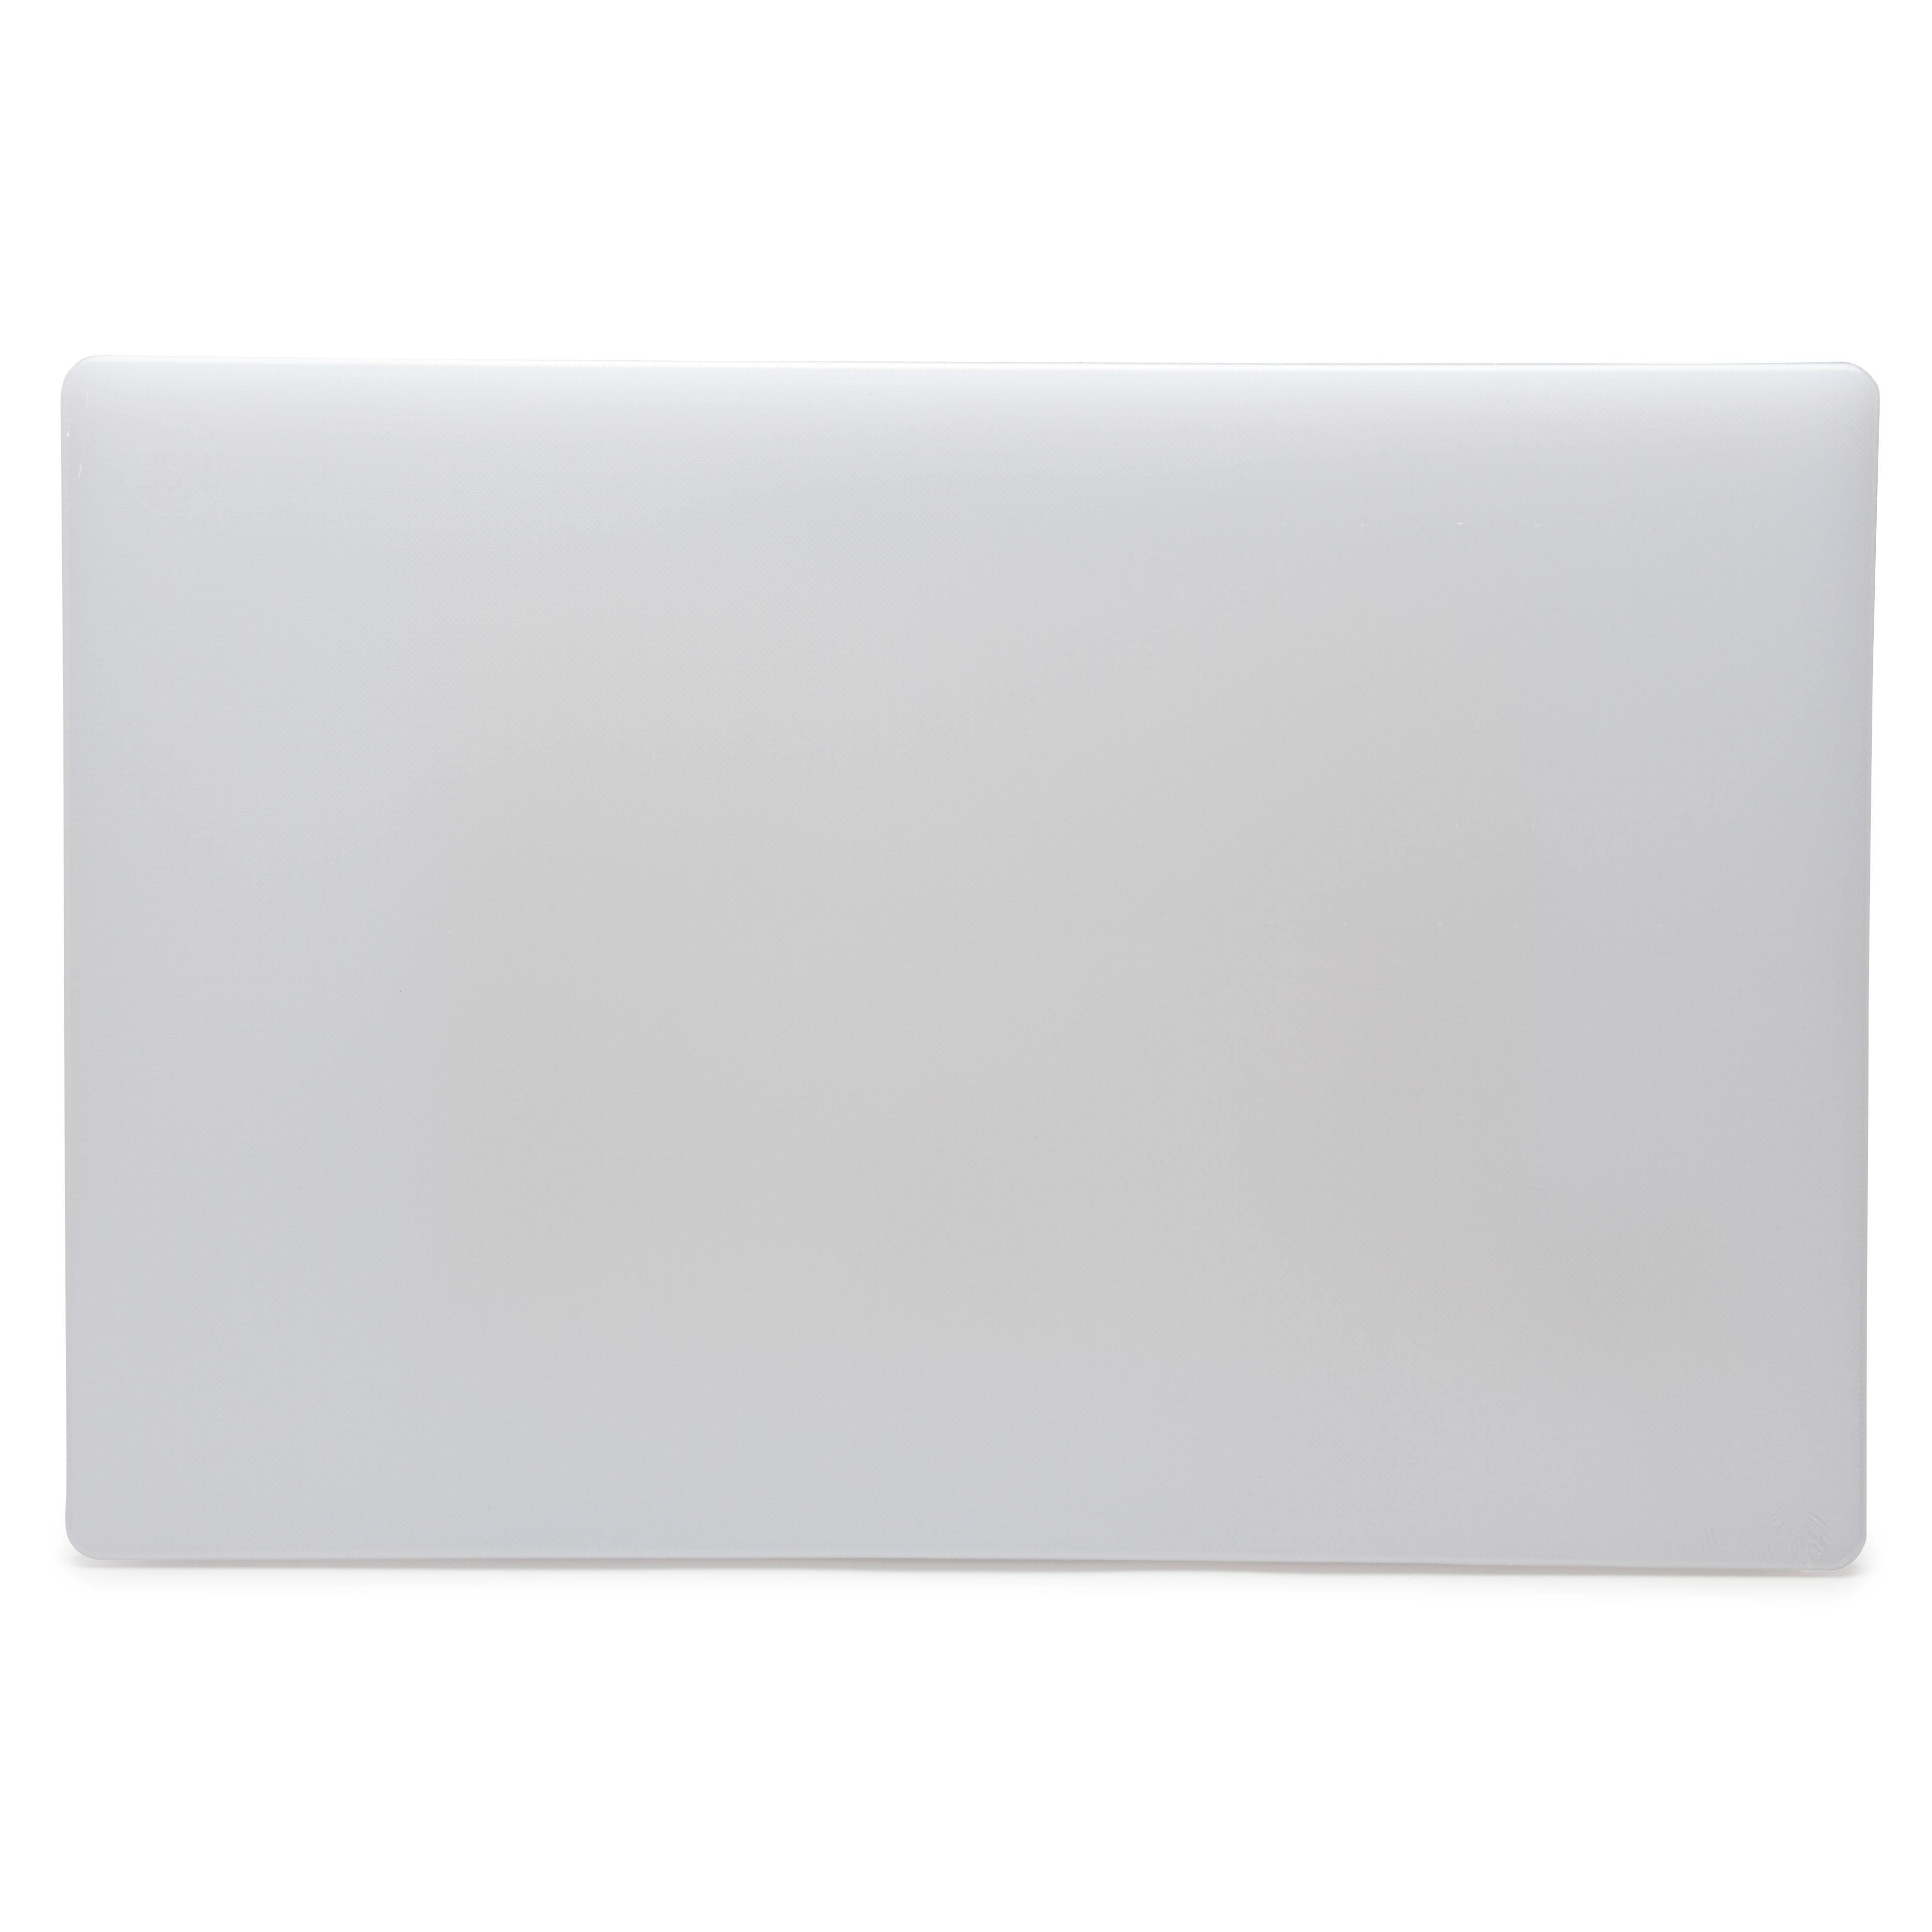 Royal Industries ROY CB 1520 WHT cutting board, plastic